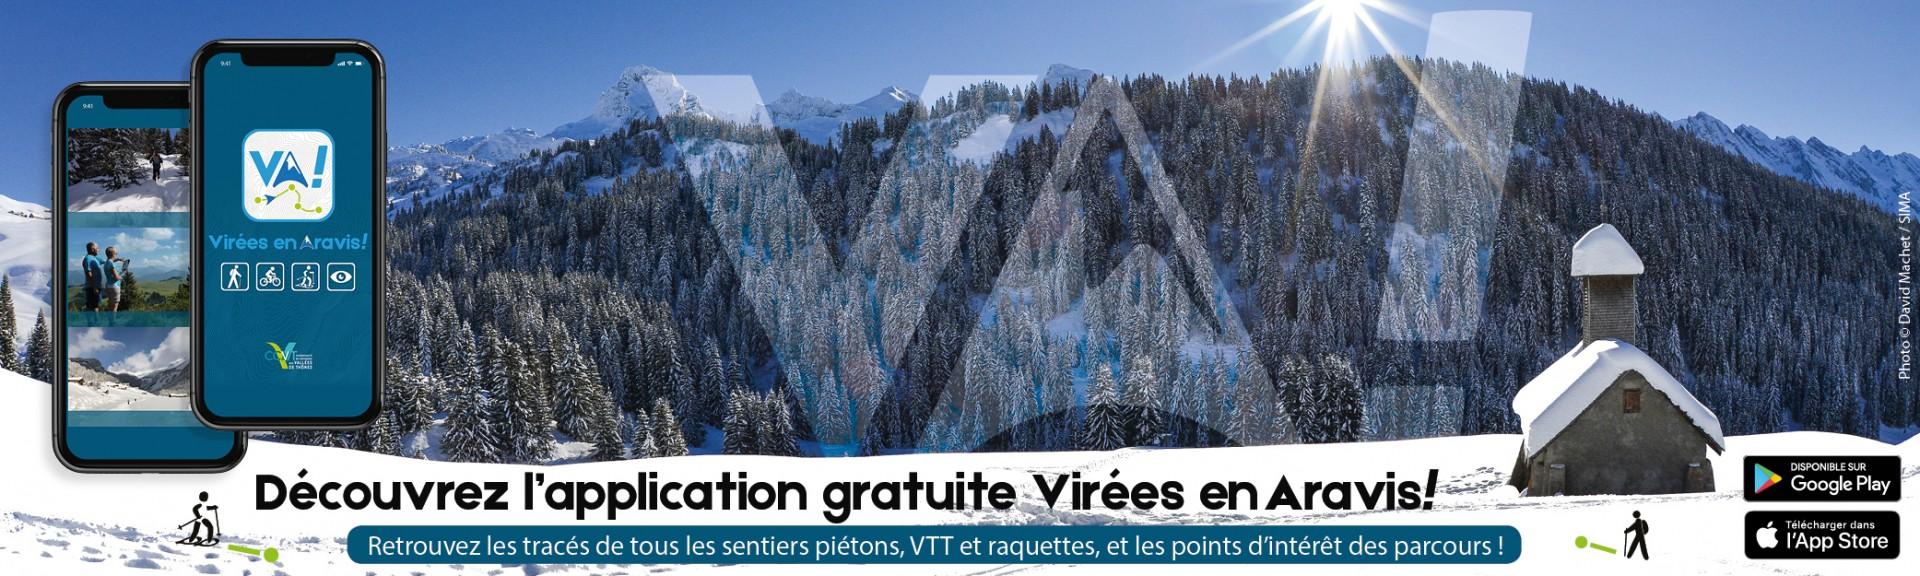 banniere-va-1000x300-165571